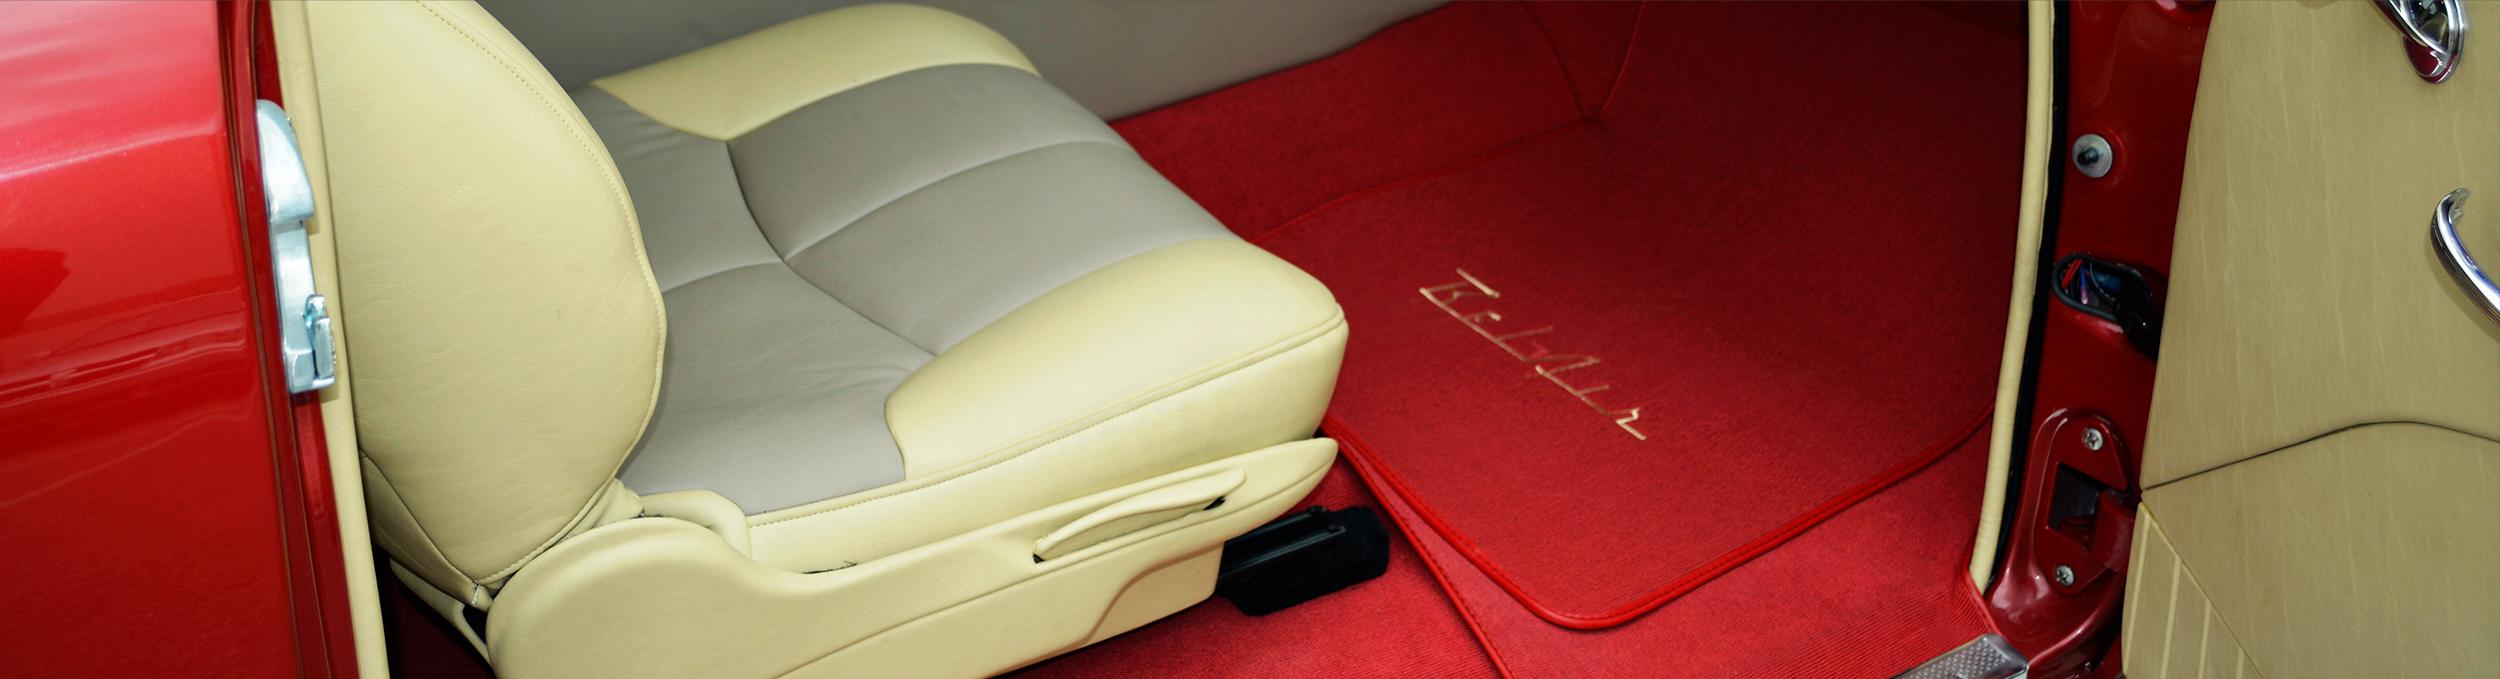 Custom Automotive Carpet, Floor Mats, & More | Auto Custom ...